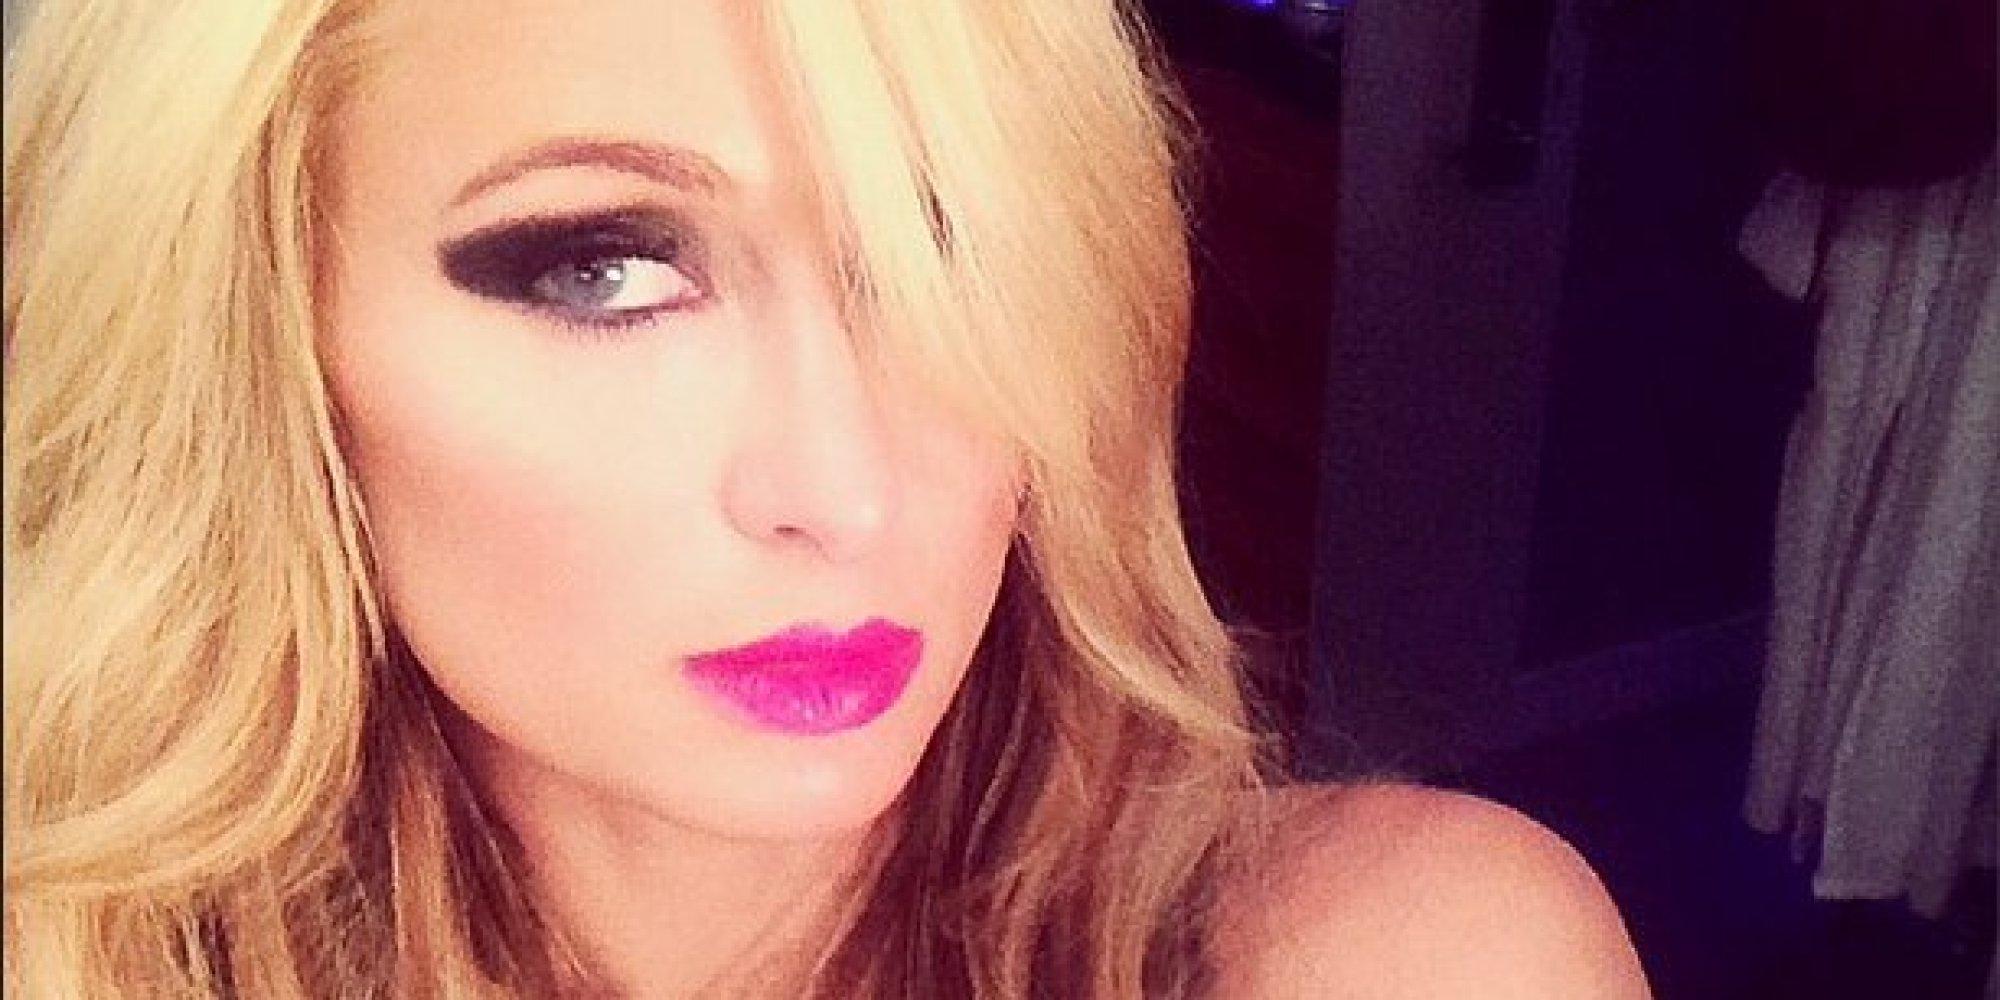 Paris Hilton Shares Photos From Her Bondage-Themed Shoot